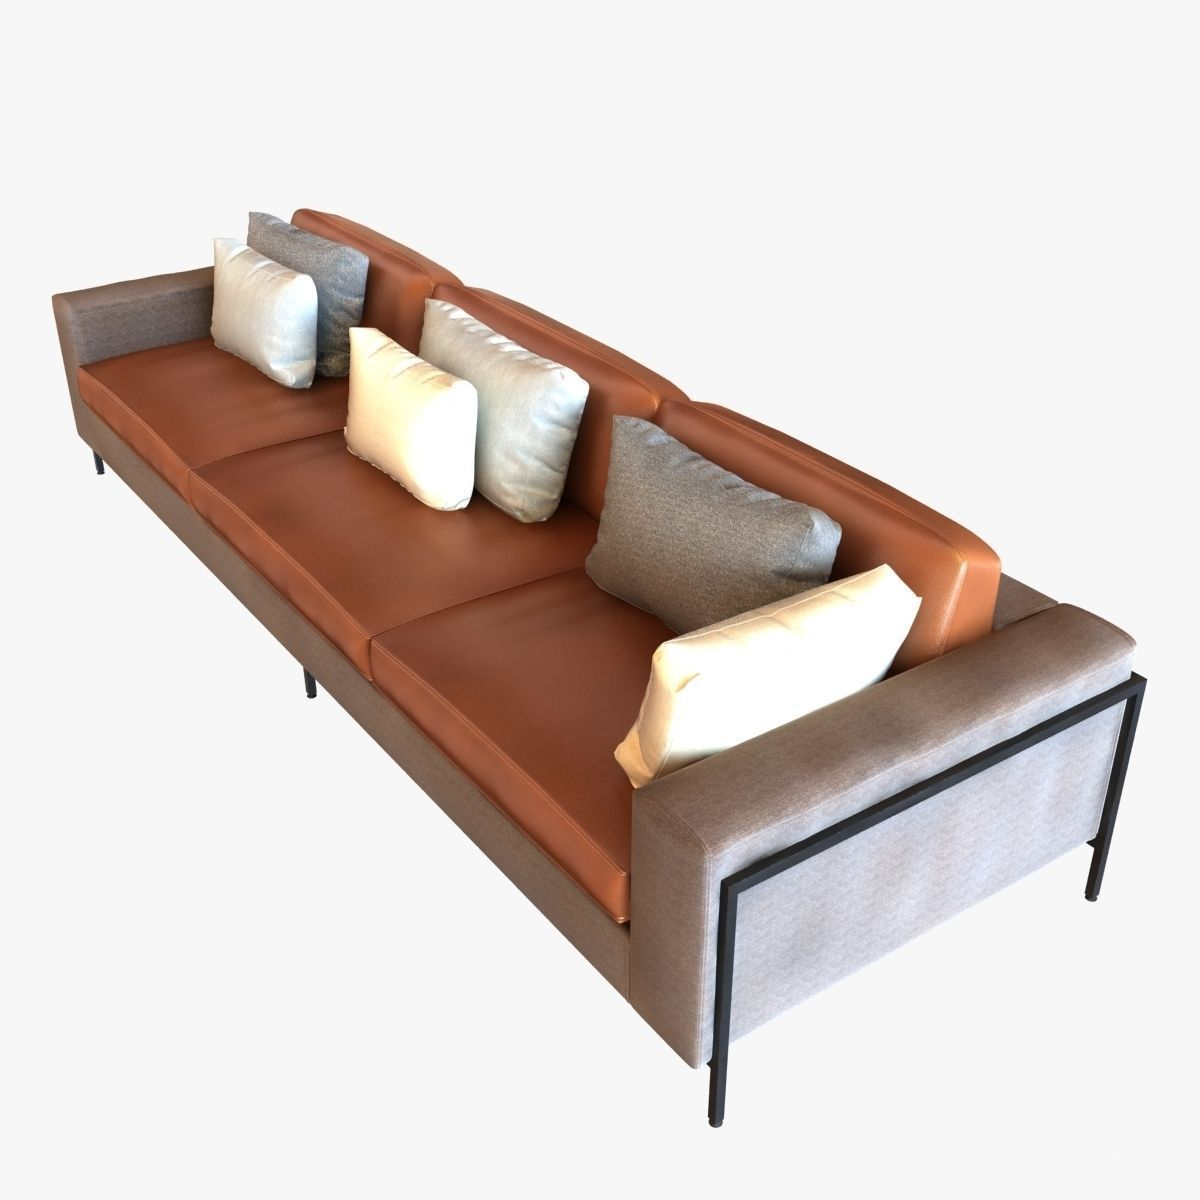 Ralph Pucci Upholstery 3 Seat Sofa 3d Model Max Obj Fbx Mtl